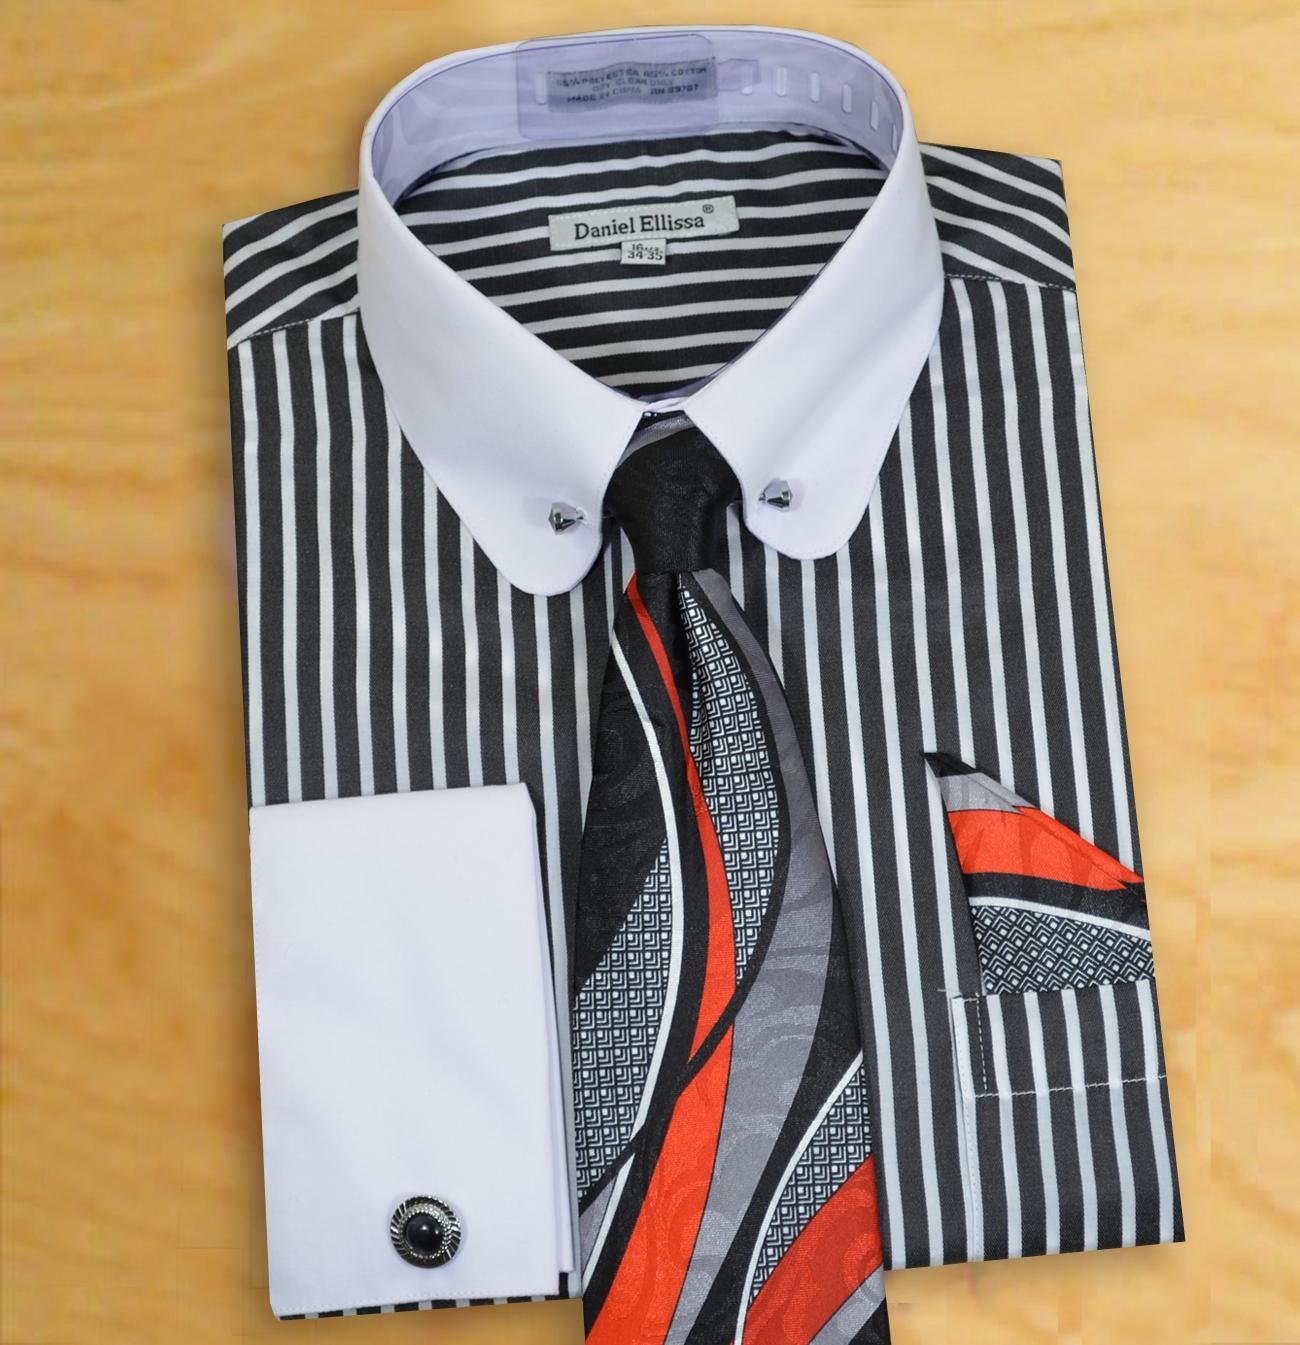 Daniel ellissa black white vertical striped dress shirt for Vertical striped dress shirt